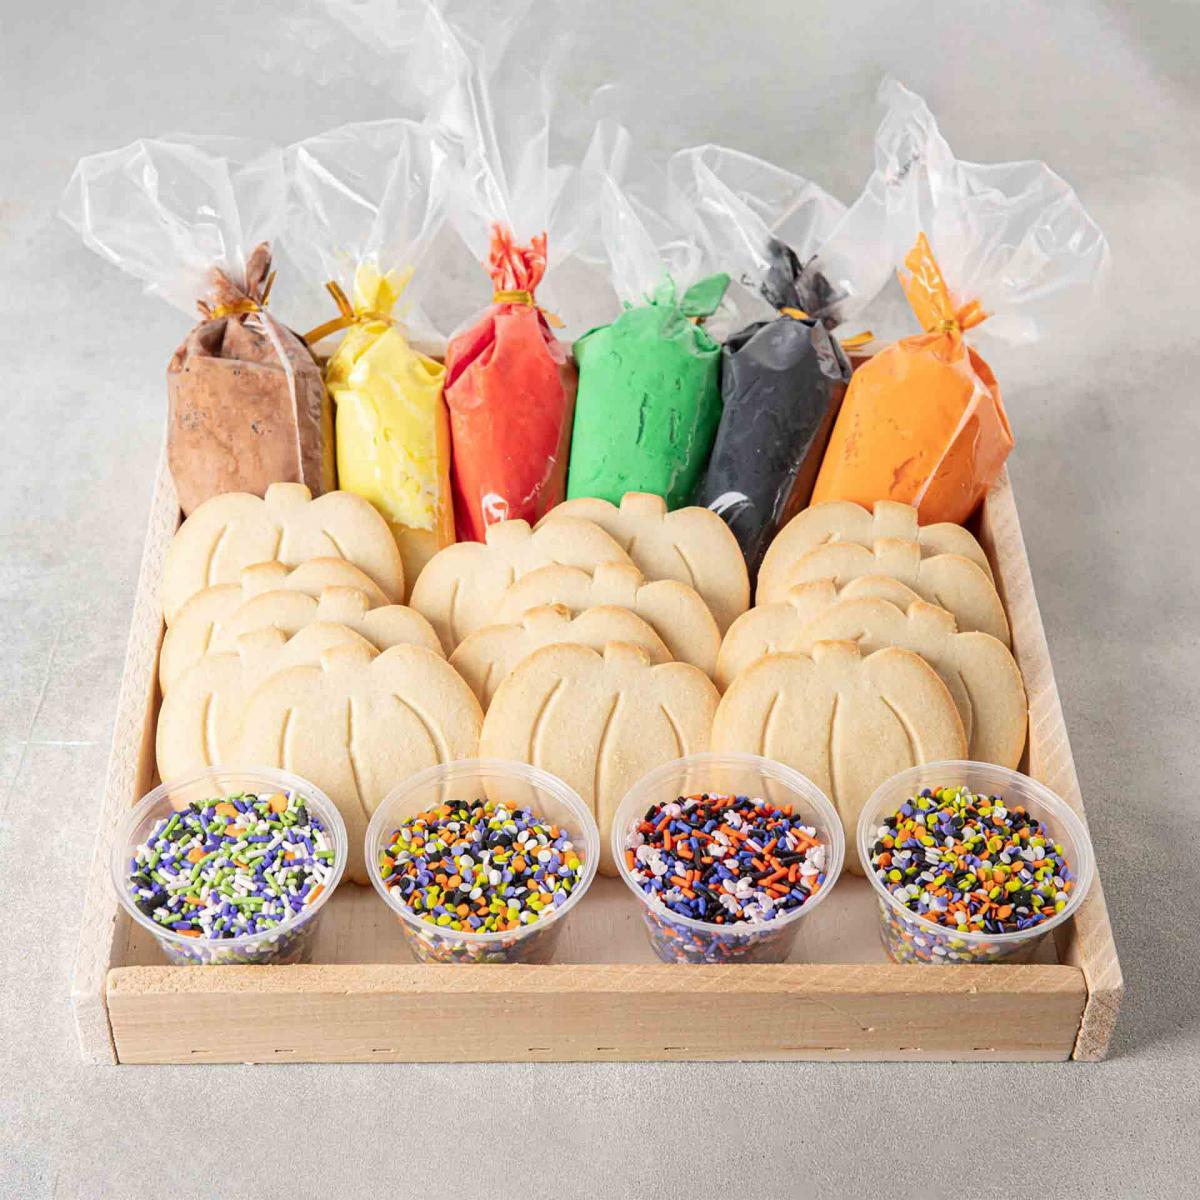 Halloween cookie decorating kit with pumpkin cookies